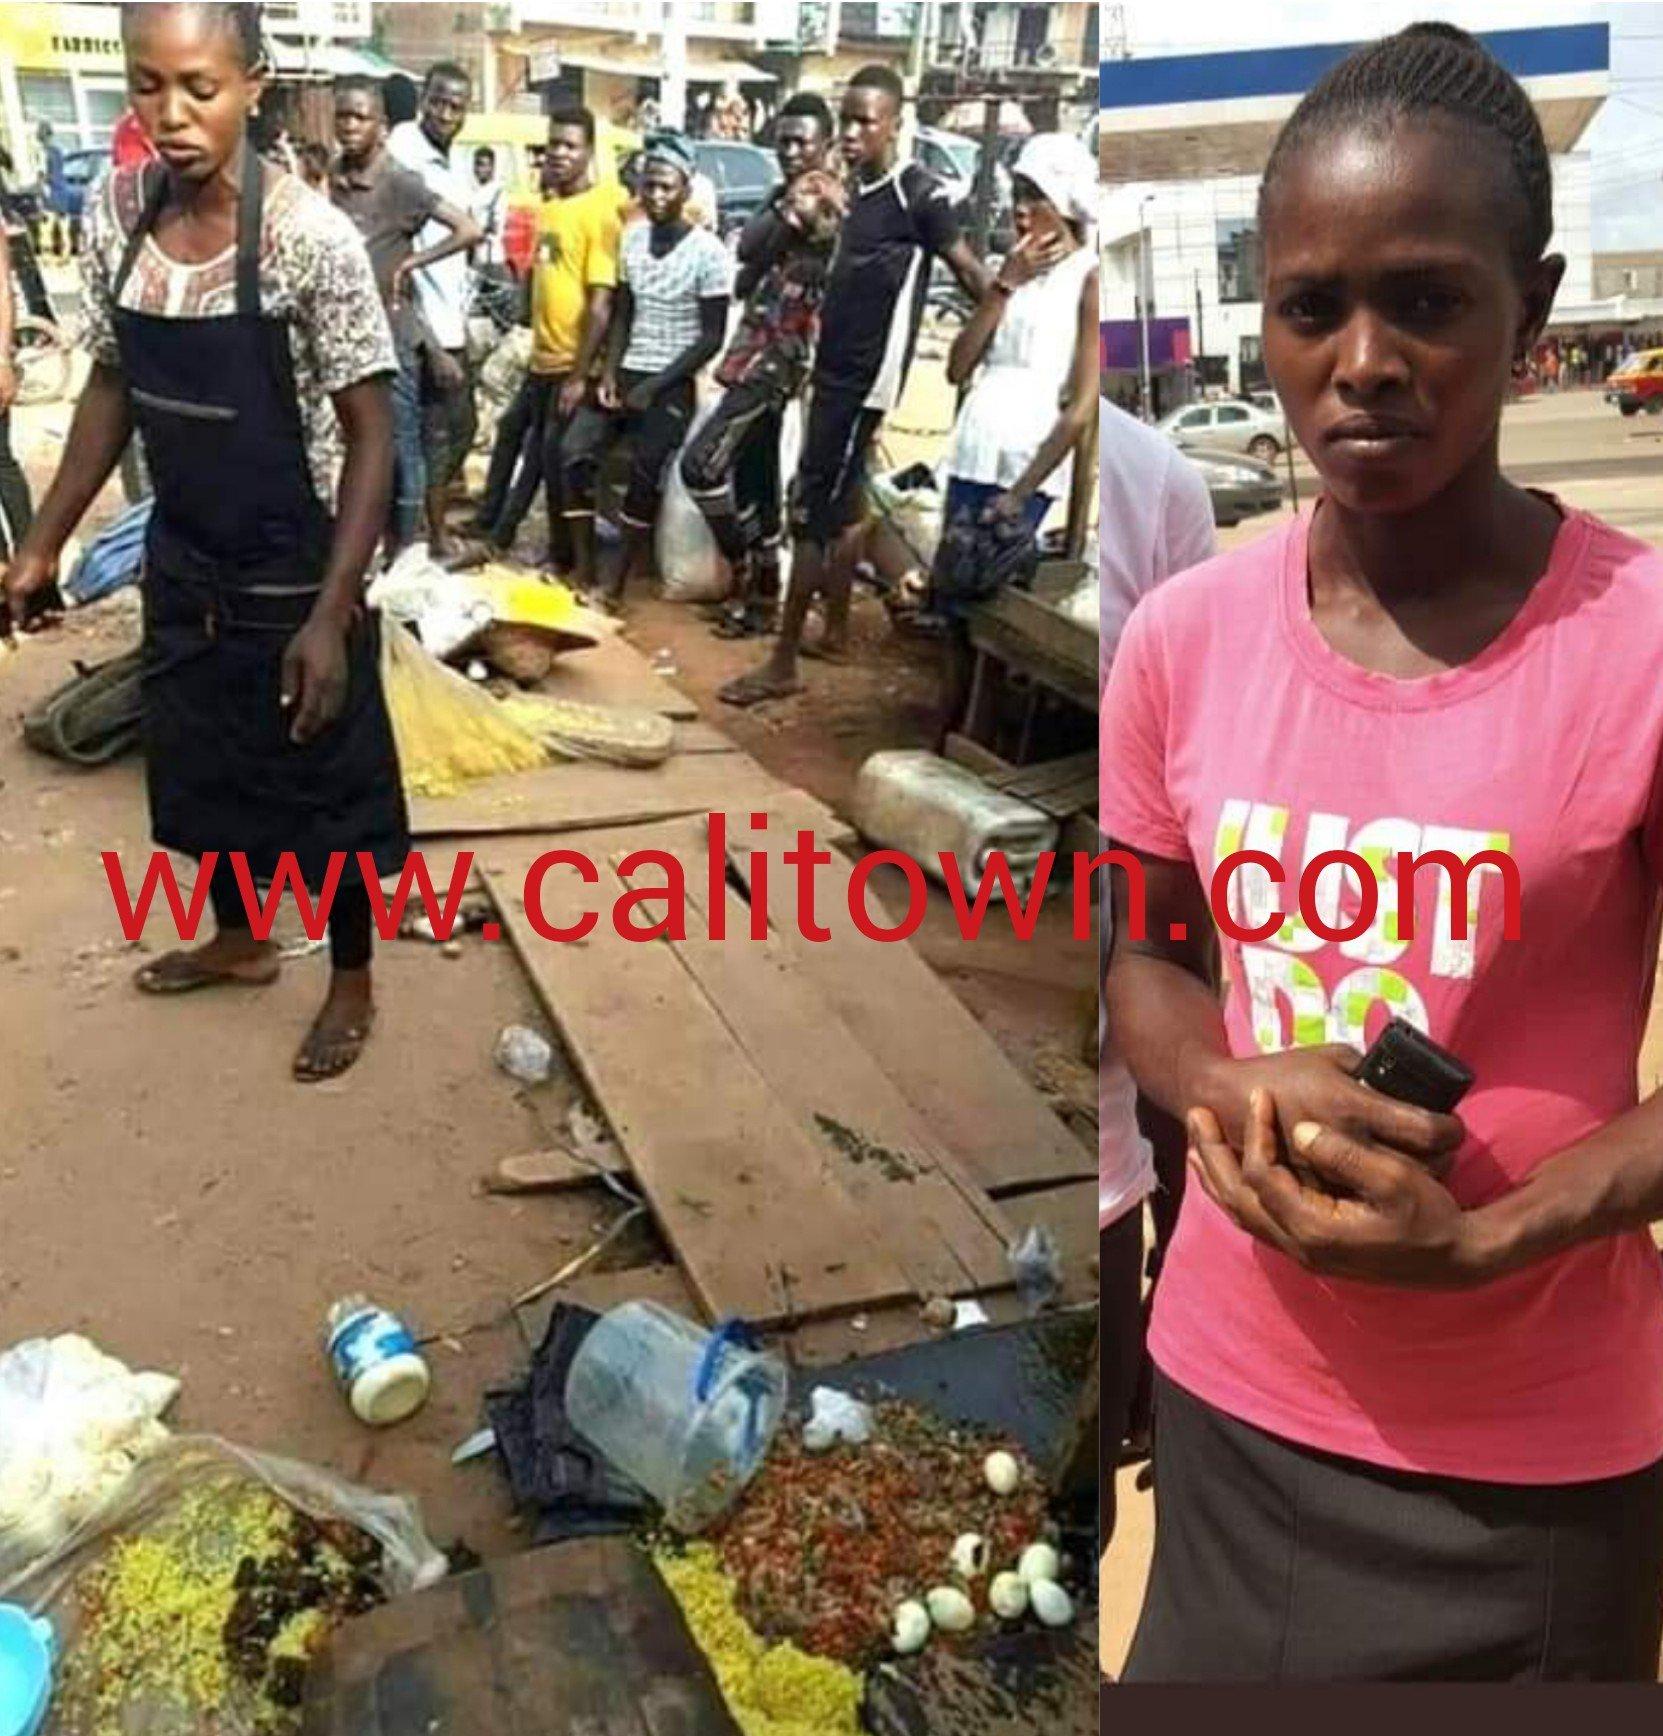 Philanthropic Cross Riverian Blesses Distraught Edo Based Street Hawker